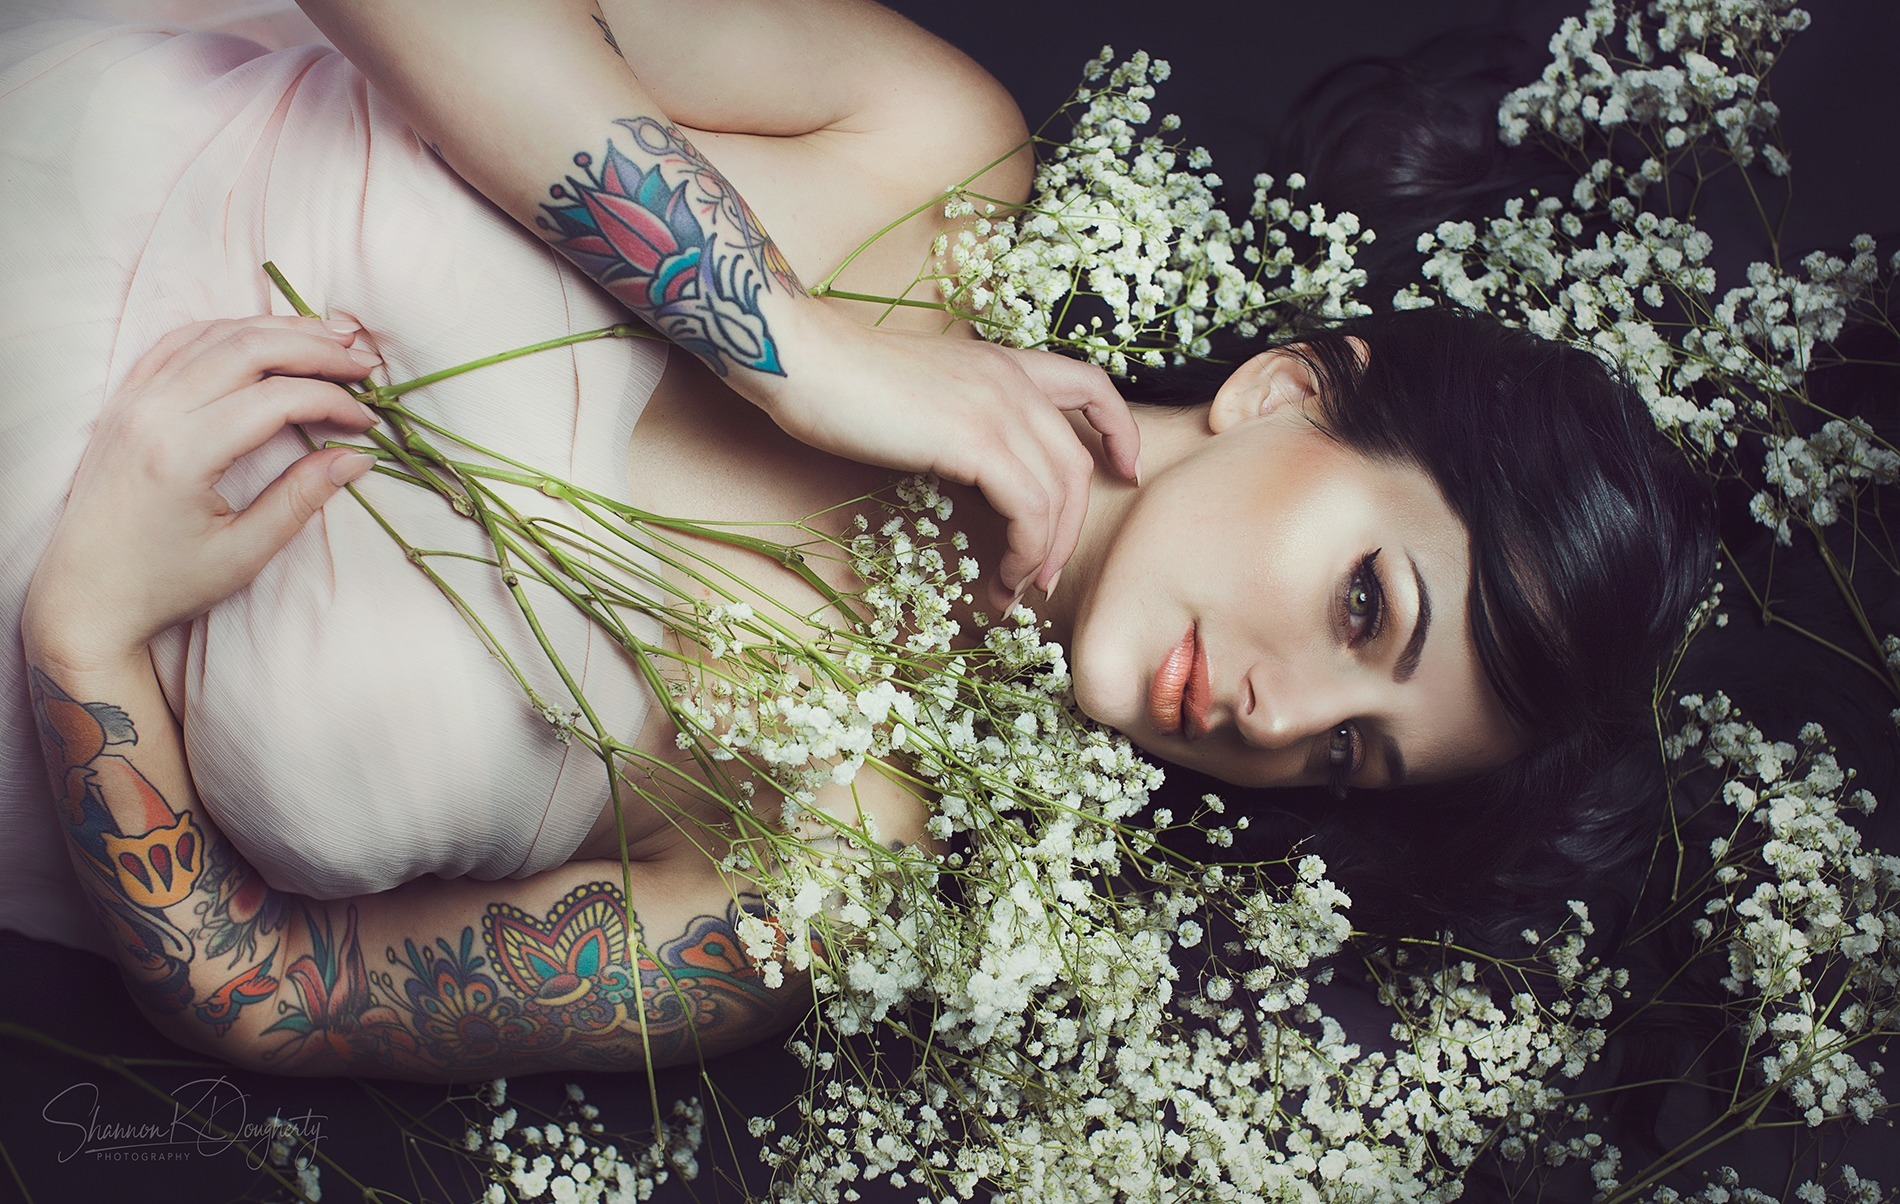 Shannon K Dougherty (@shannonkdougherty) Cover Image